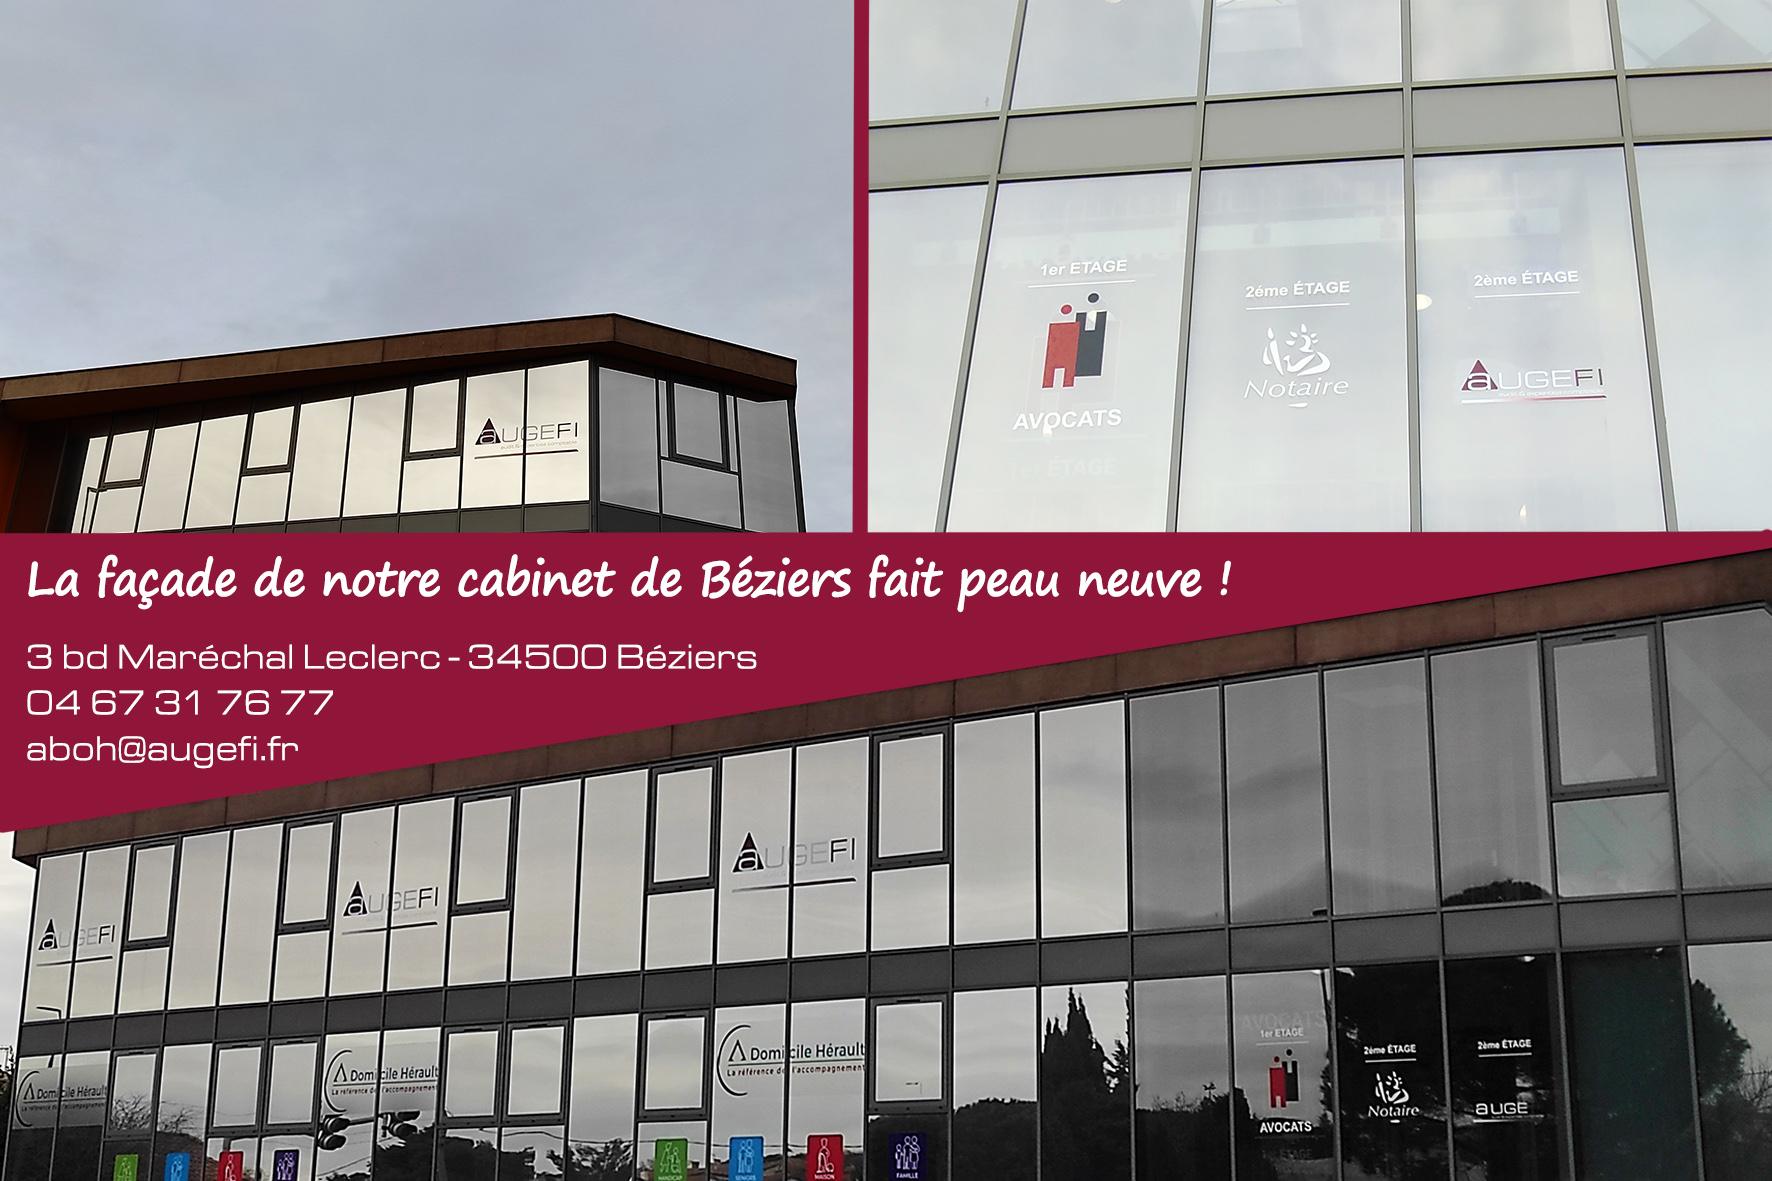 20201222 - Signalétique façade Augefi Béziers